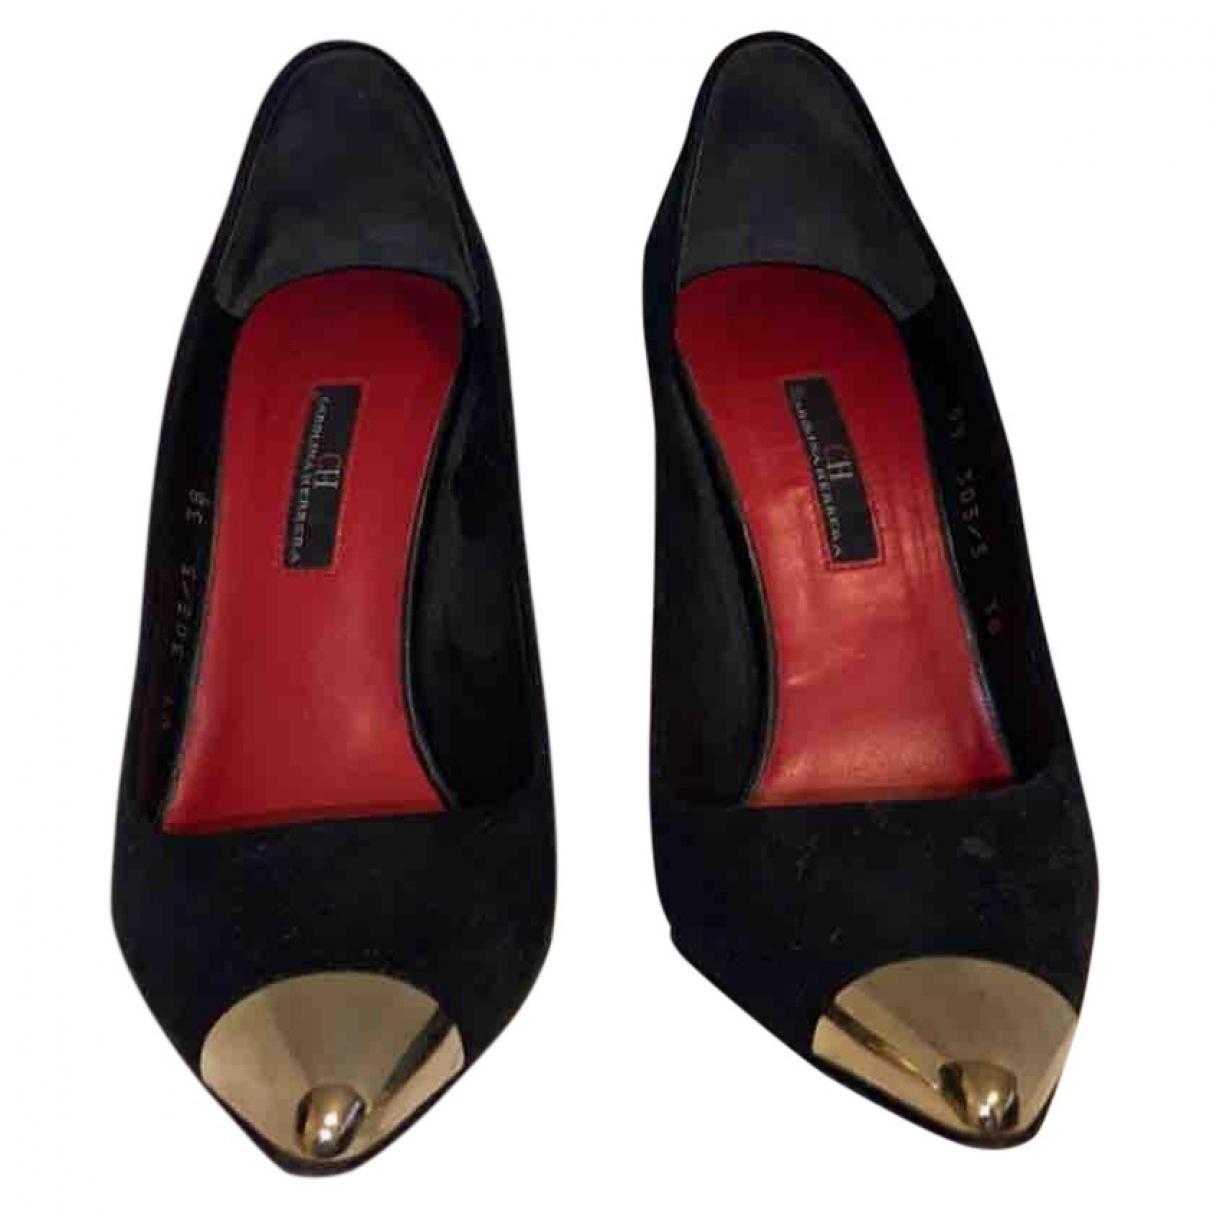 Carolina Herrera - Escarpins   pour femme en suede - noir